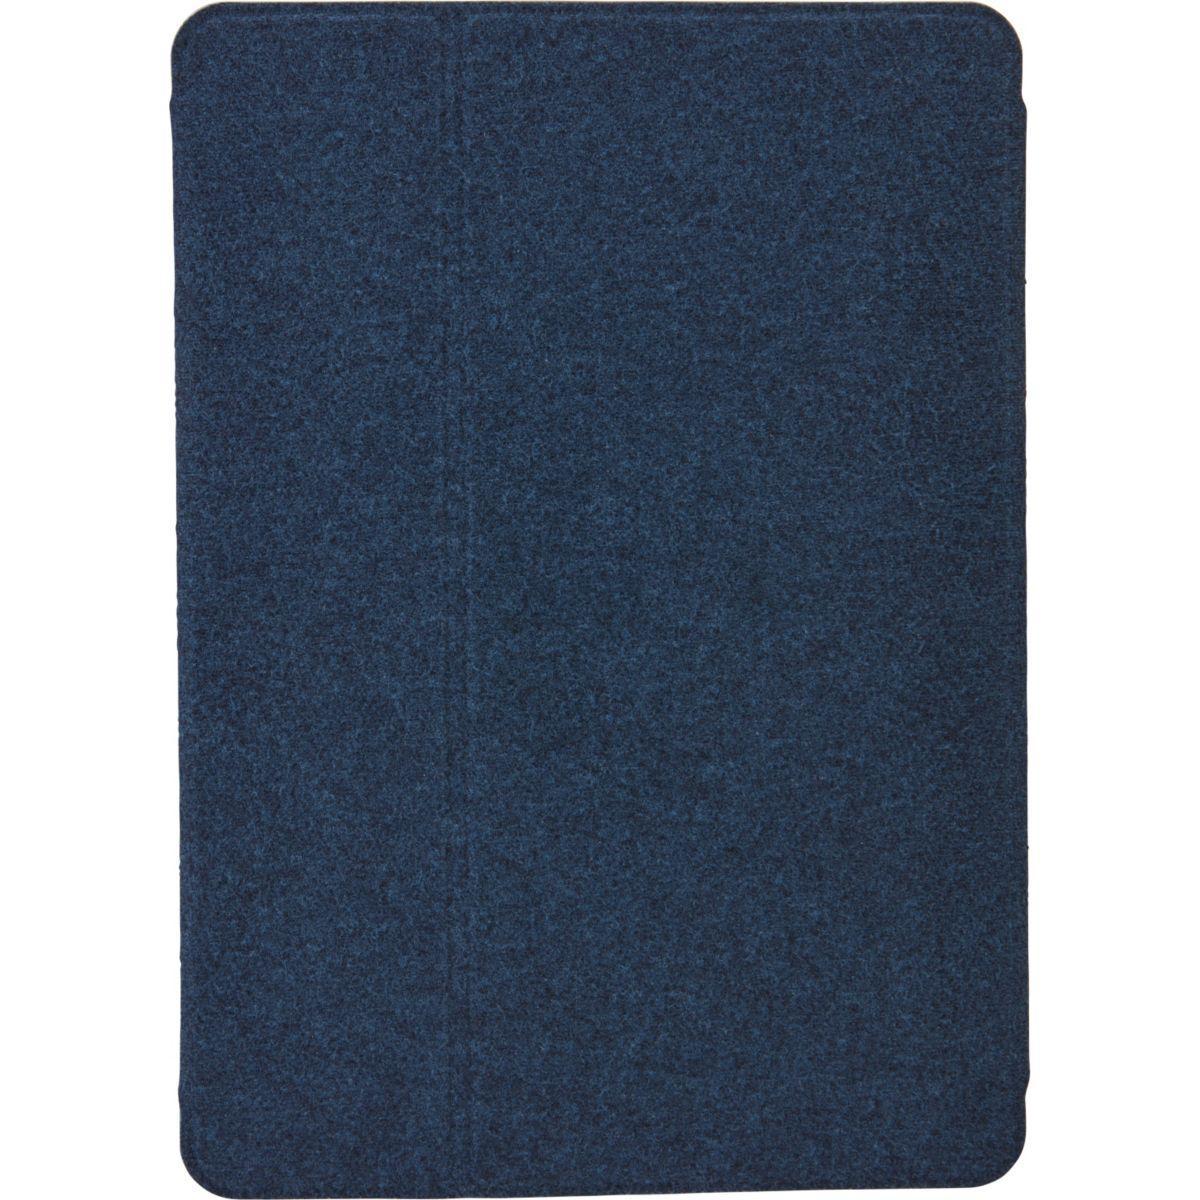 Etui tablette caselogic ipad pro 9.7 bleu ultra slim - livraison offerte : code liv (photo)